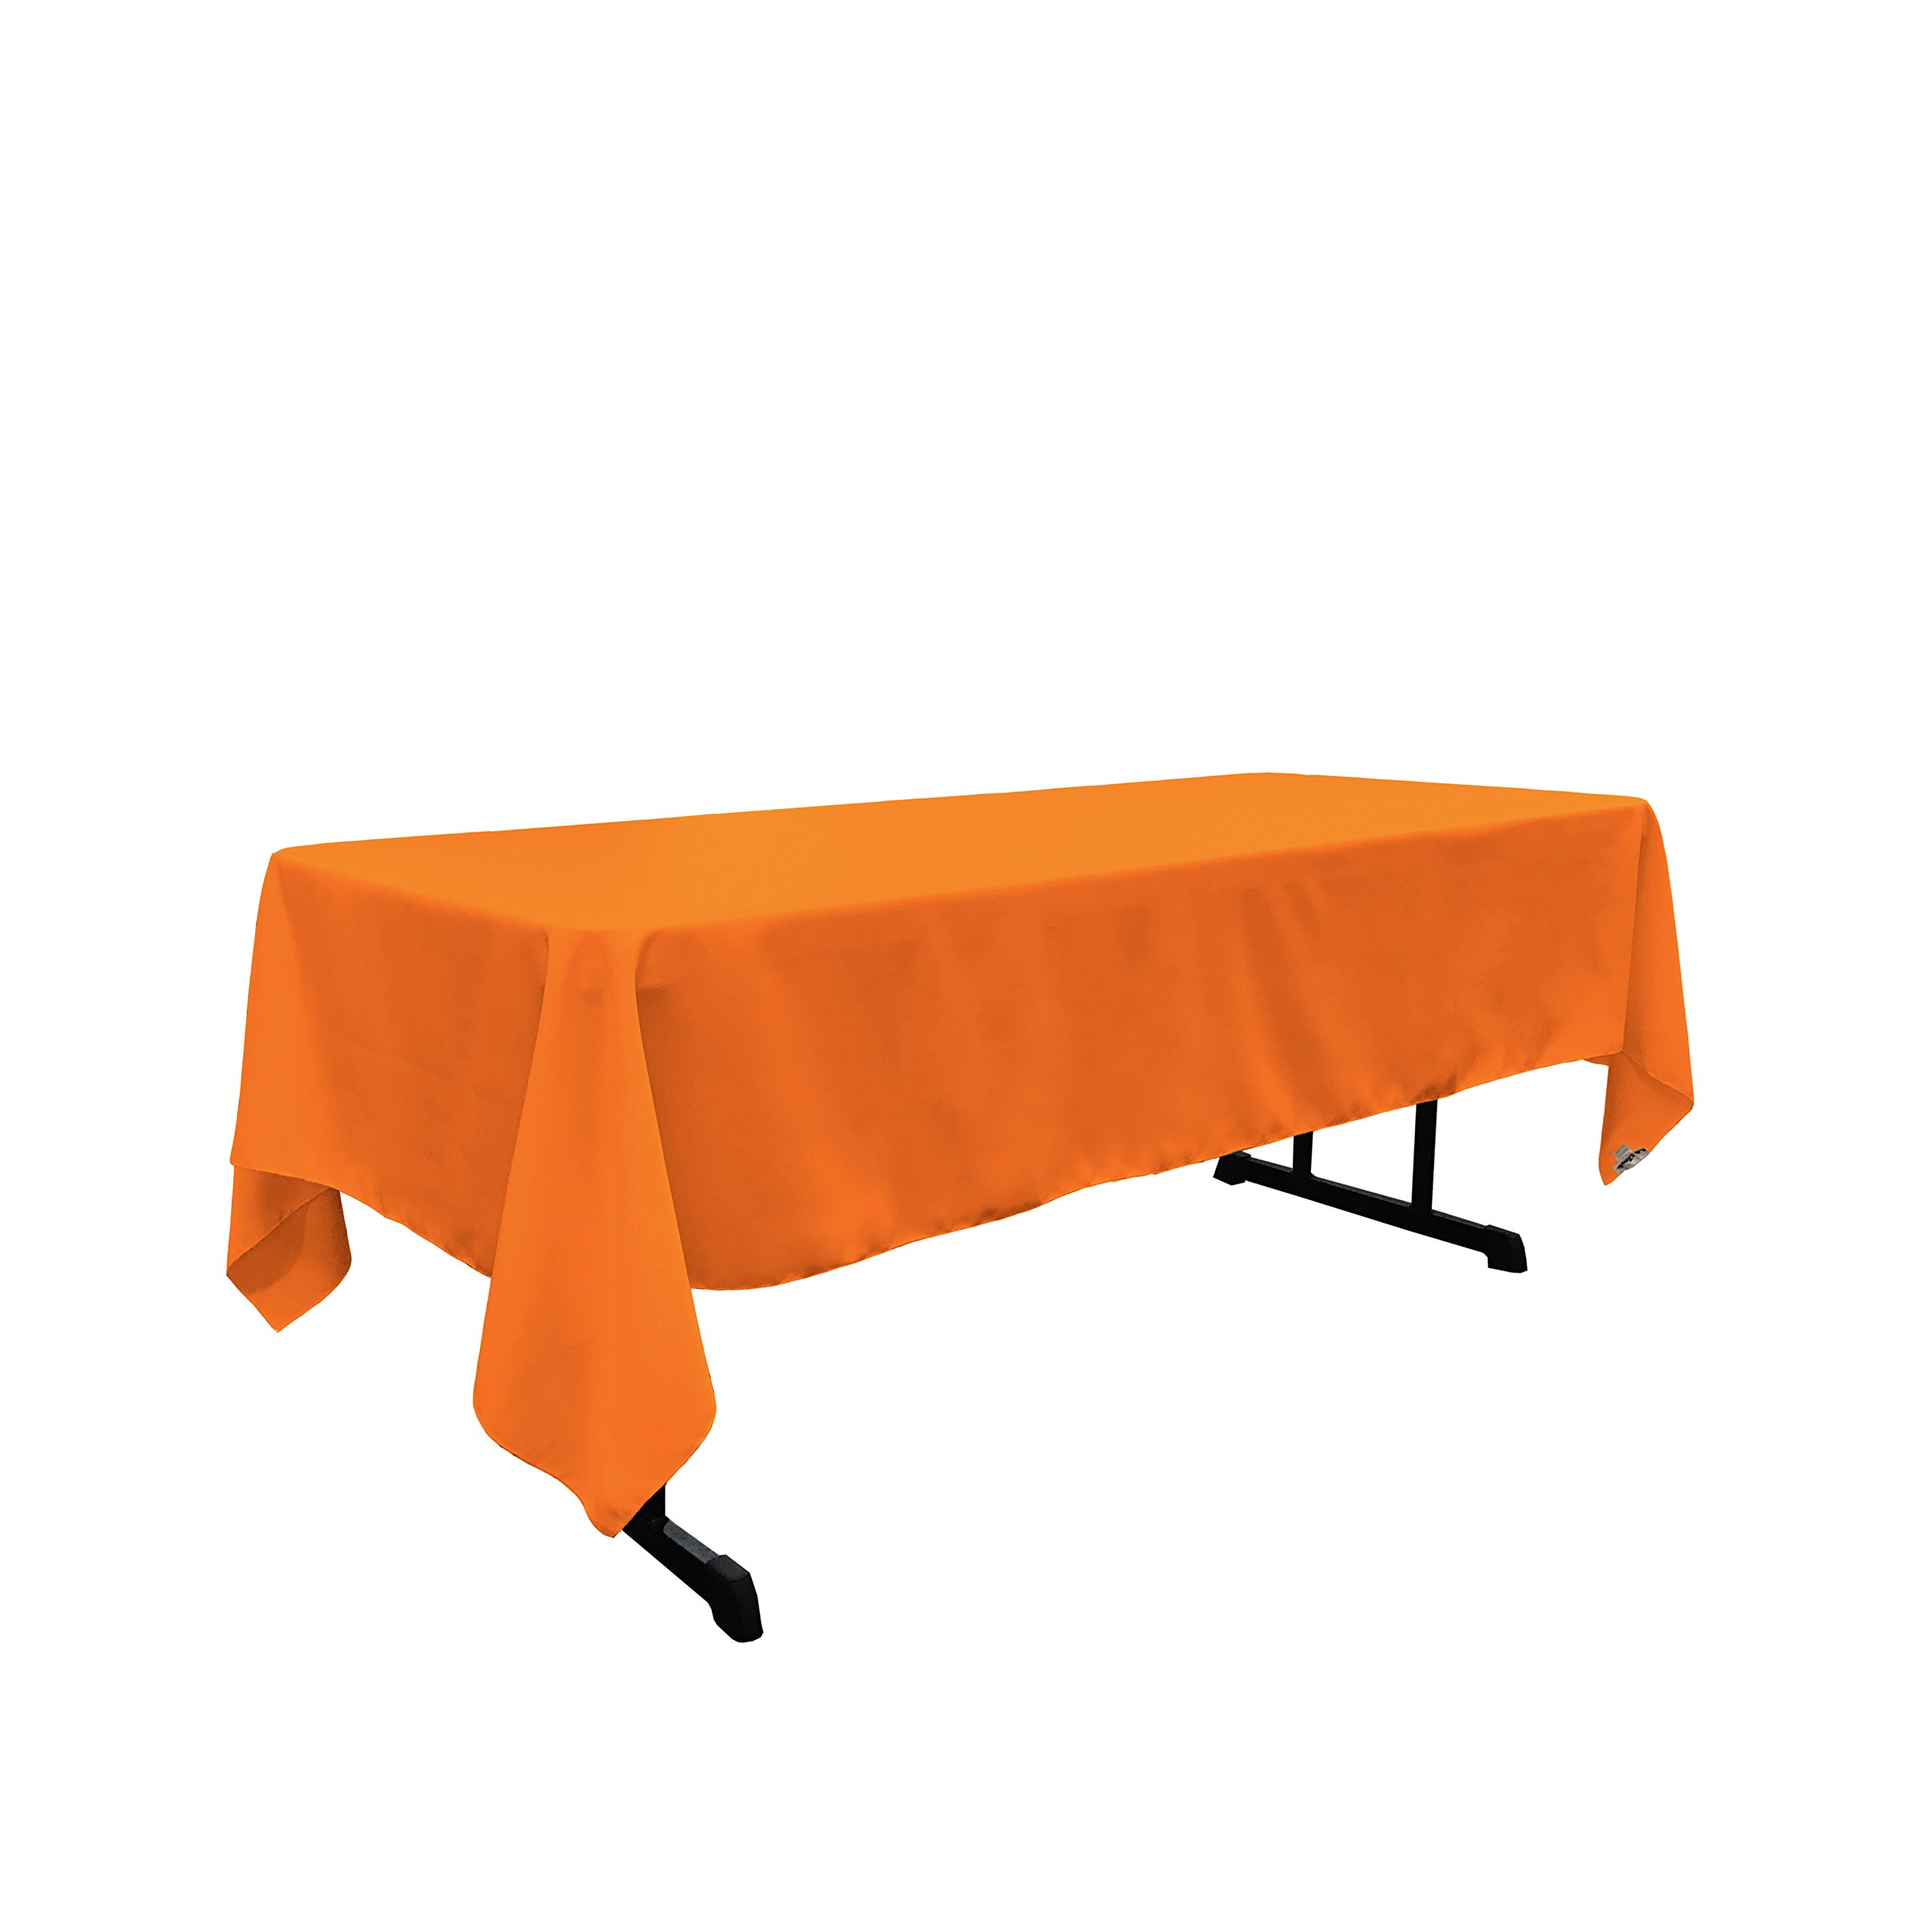 LA Linen Polyester Poplin Rectangular Tablecloth, 60 by 120-Inch, Orange